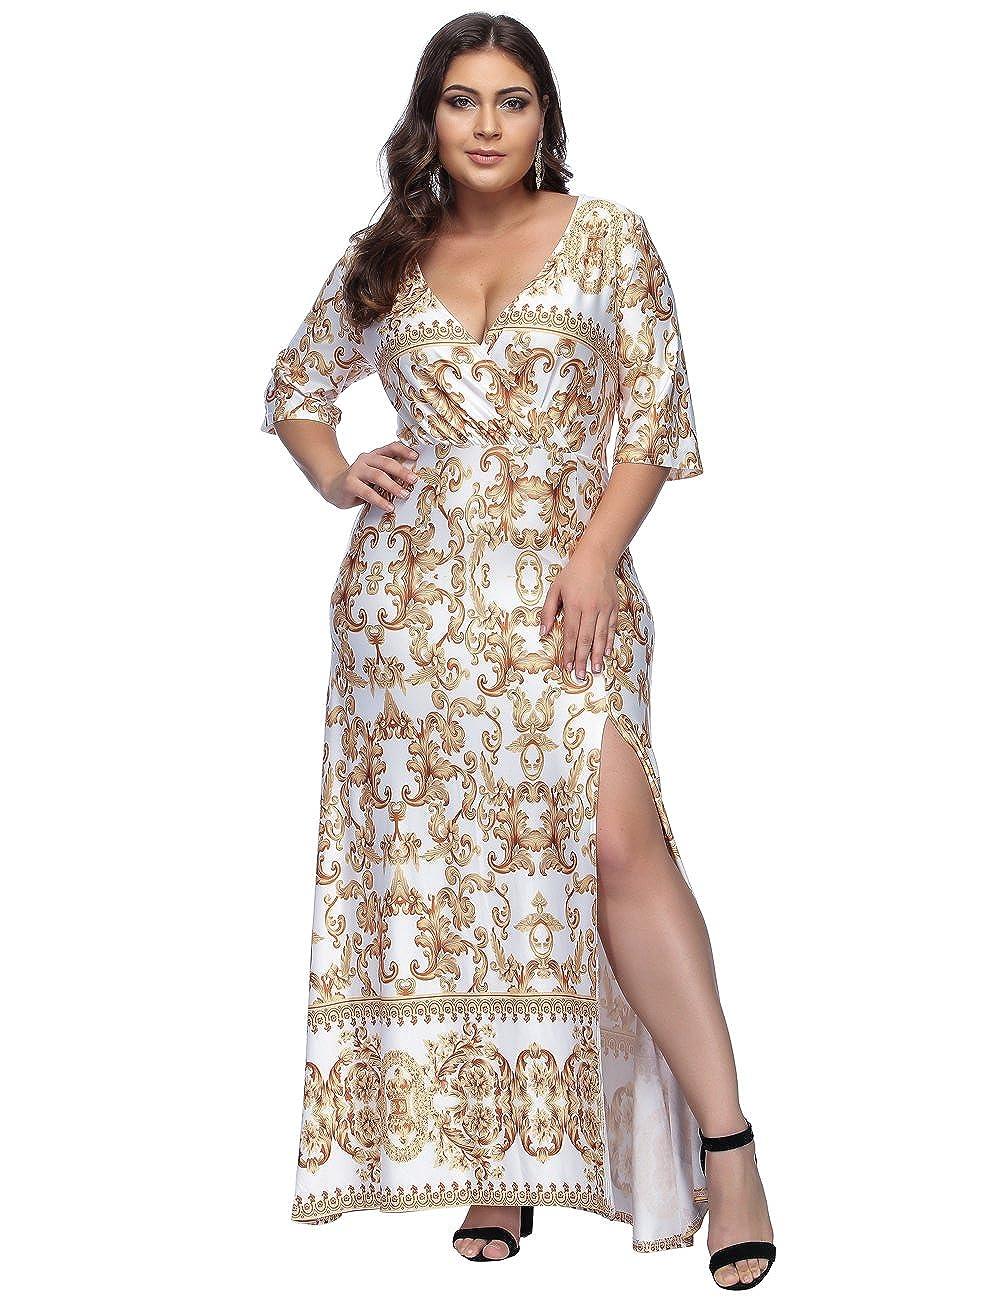 FeelinGirl Damen V Ausschnitt Spaghetti Buegel Blumen Sommerkleid Elegant Vintage Cocktailkleid Kleider Groß Größe